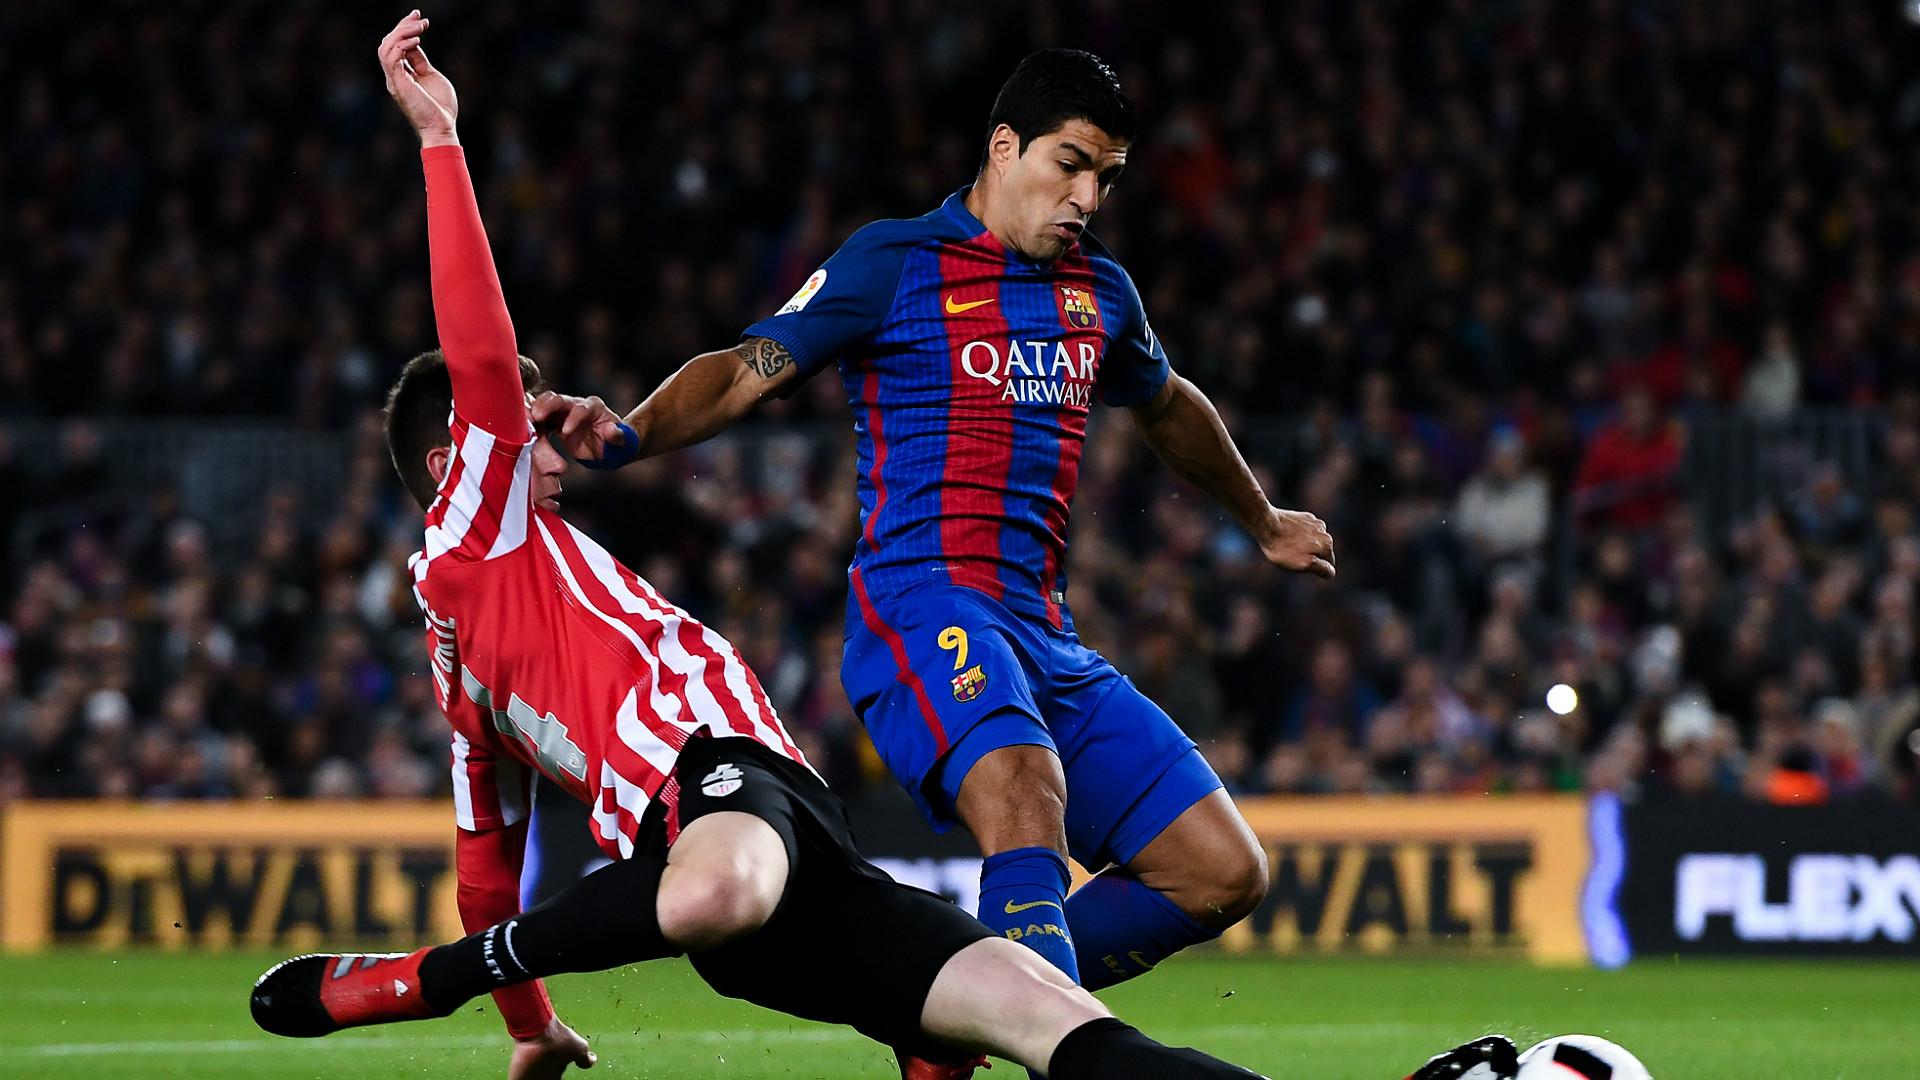 Aymeric Laporte Luis Suarez Barcelona Athletic Bilbao Copa del Rey 1112017